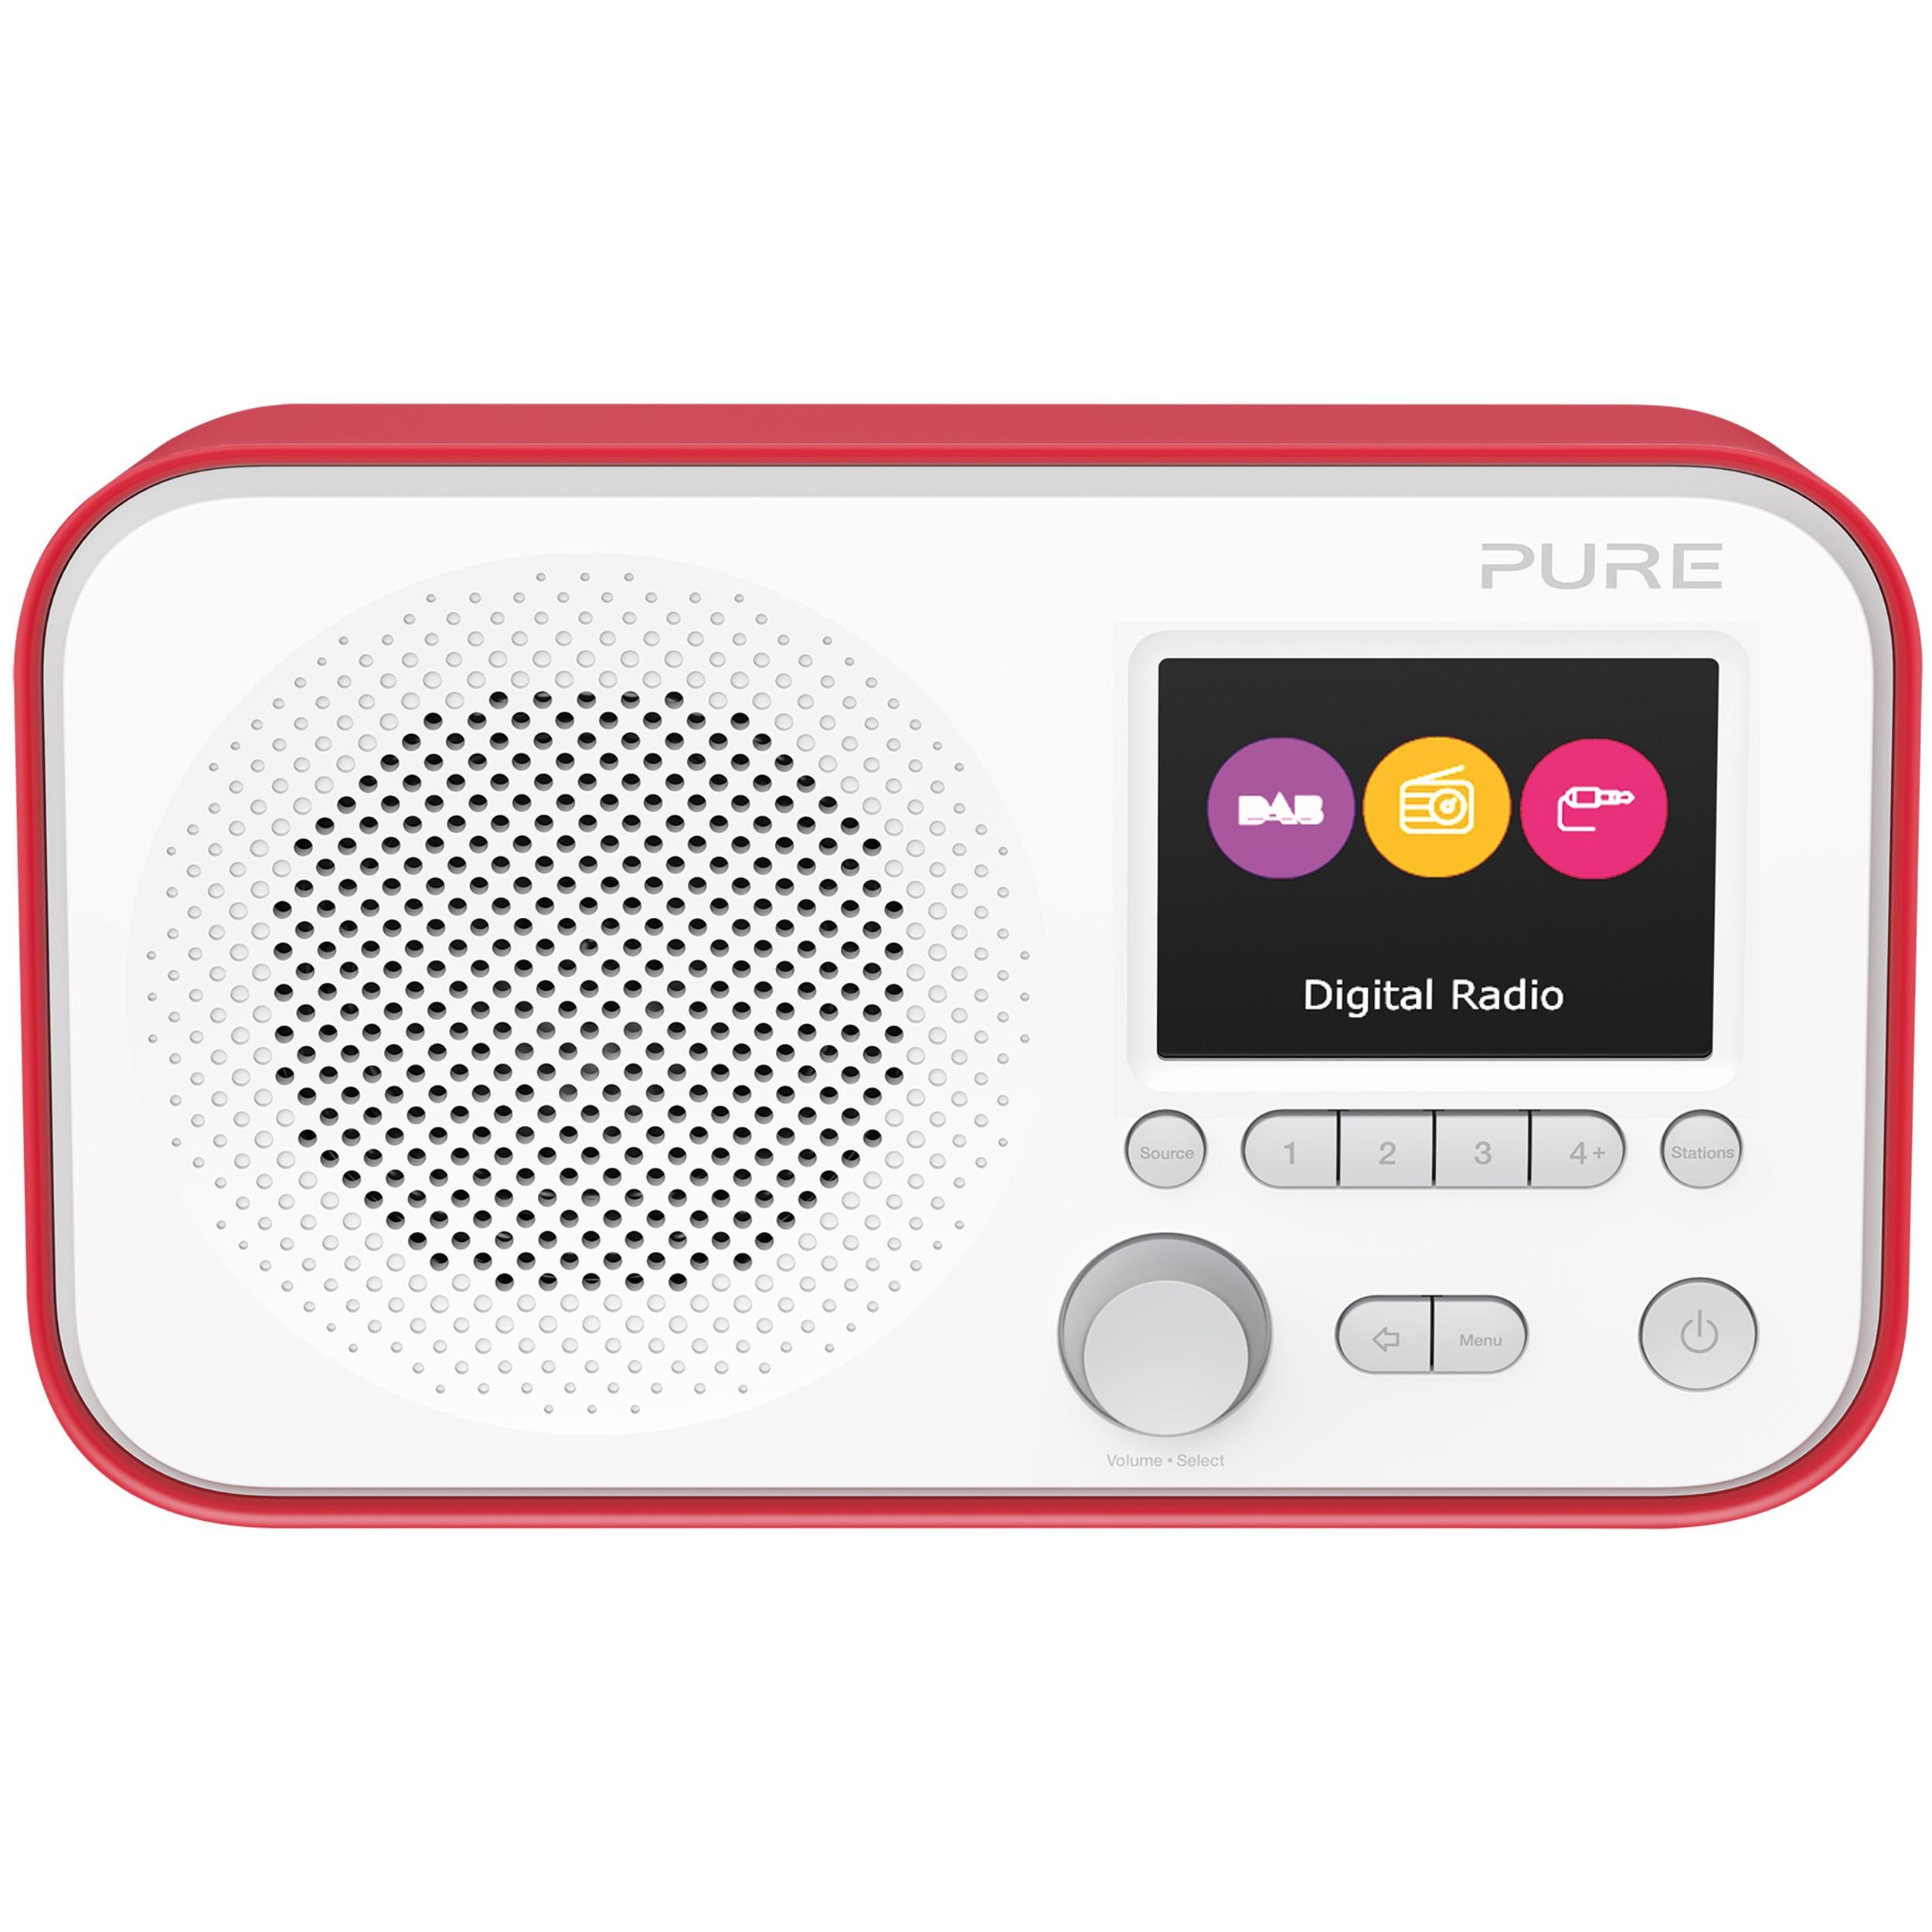 VL-62954 : Pure Elan E3 portabel DAB-radio (radio)